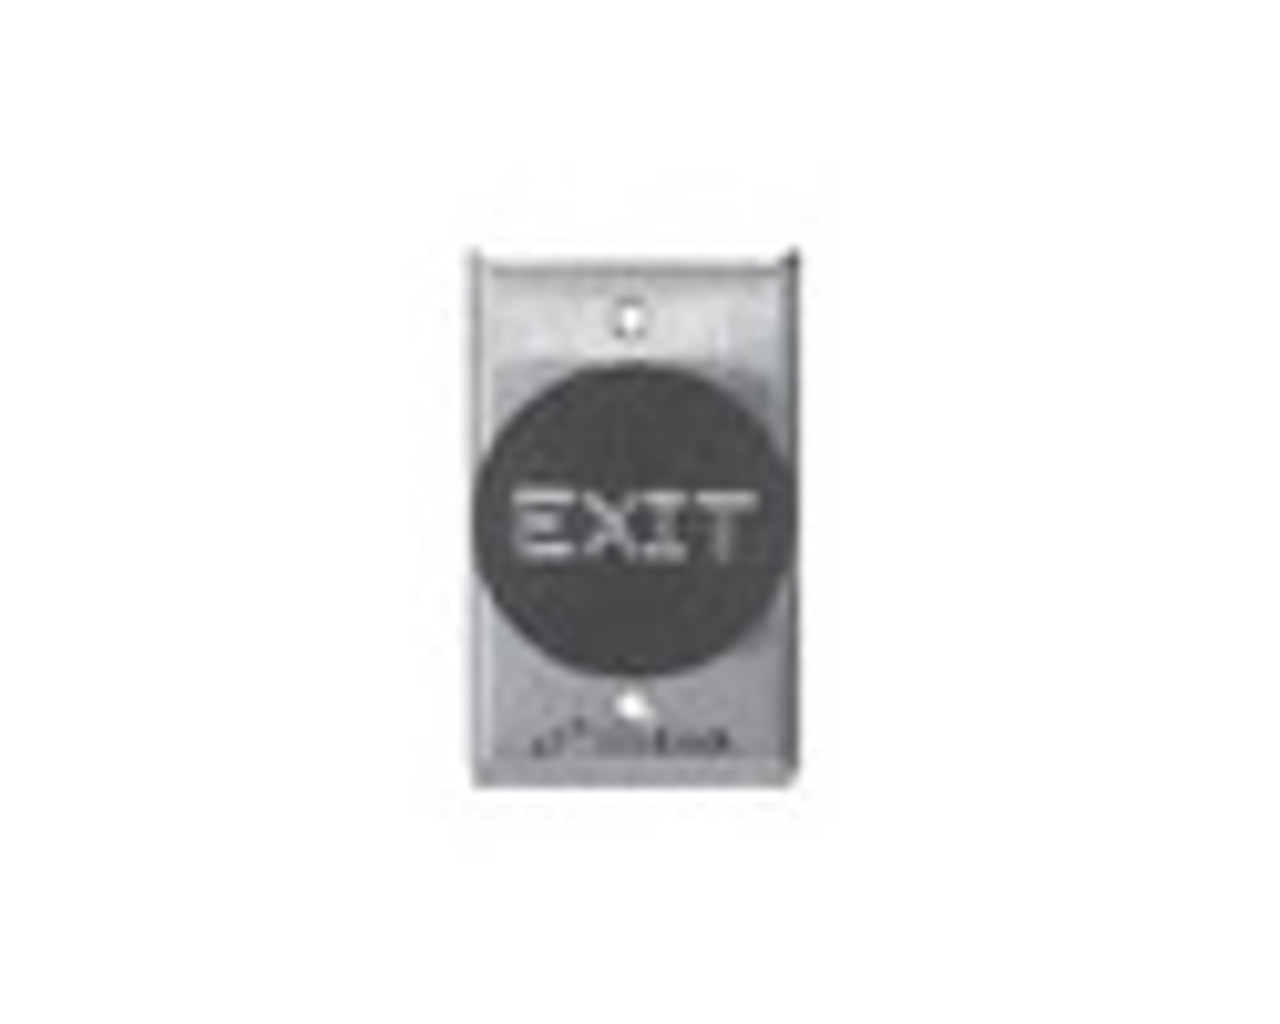 2280-US28 DynaLock 2280 Series Single SlimLine Electromagnetic Lock for Outswing Door in Satin Aluminum